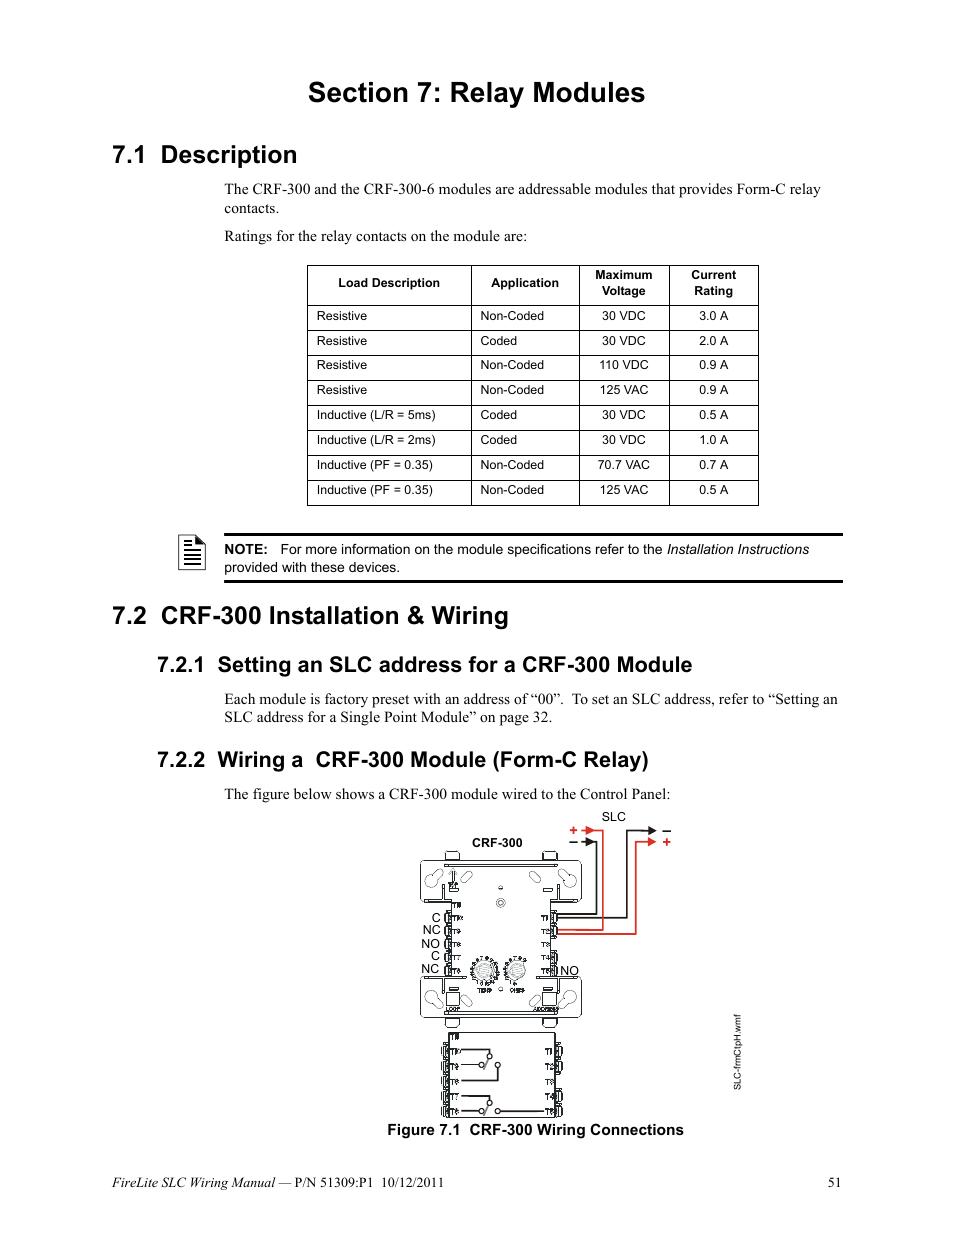 Section 7 Relay Modules, 1 Description, 2 Crf 300 Installation 120 Volt Relay  Wiring Diagram Fire Relay Module Wiring Diagram